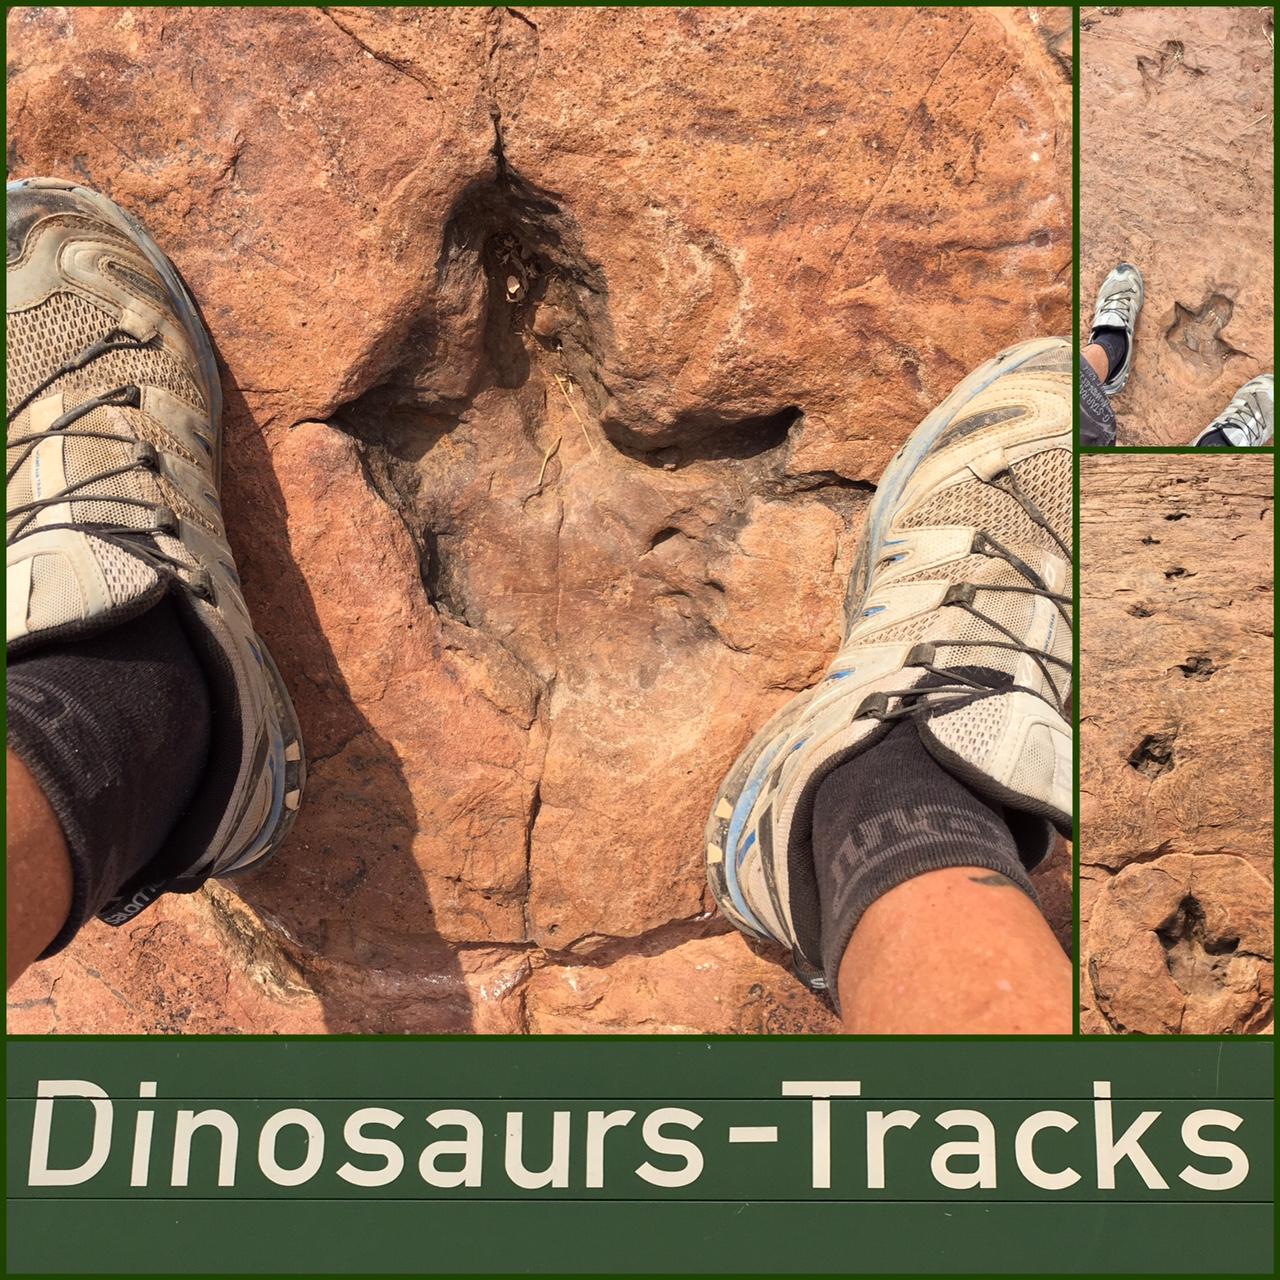 4x4 Namibie dinosaures